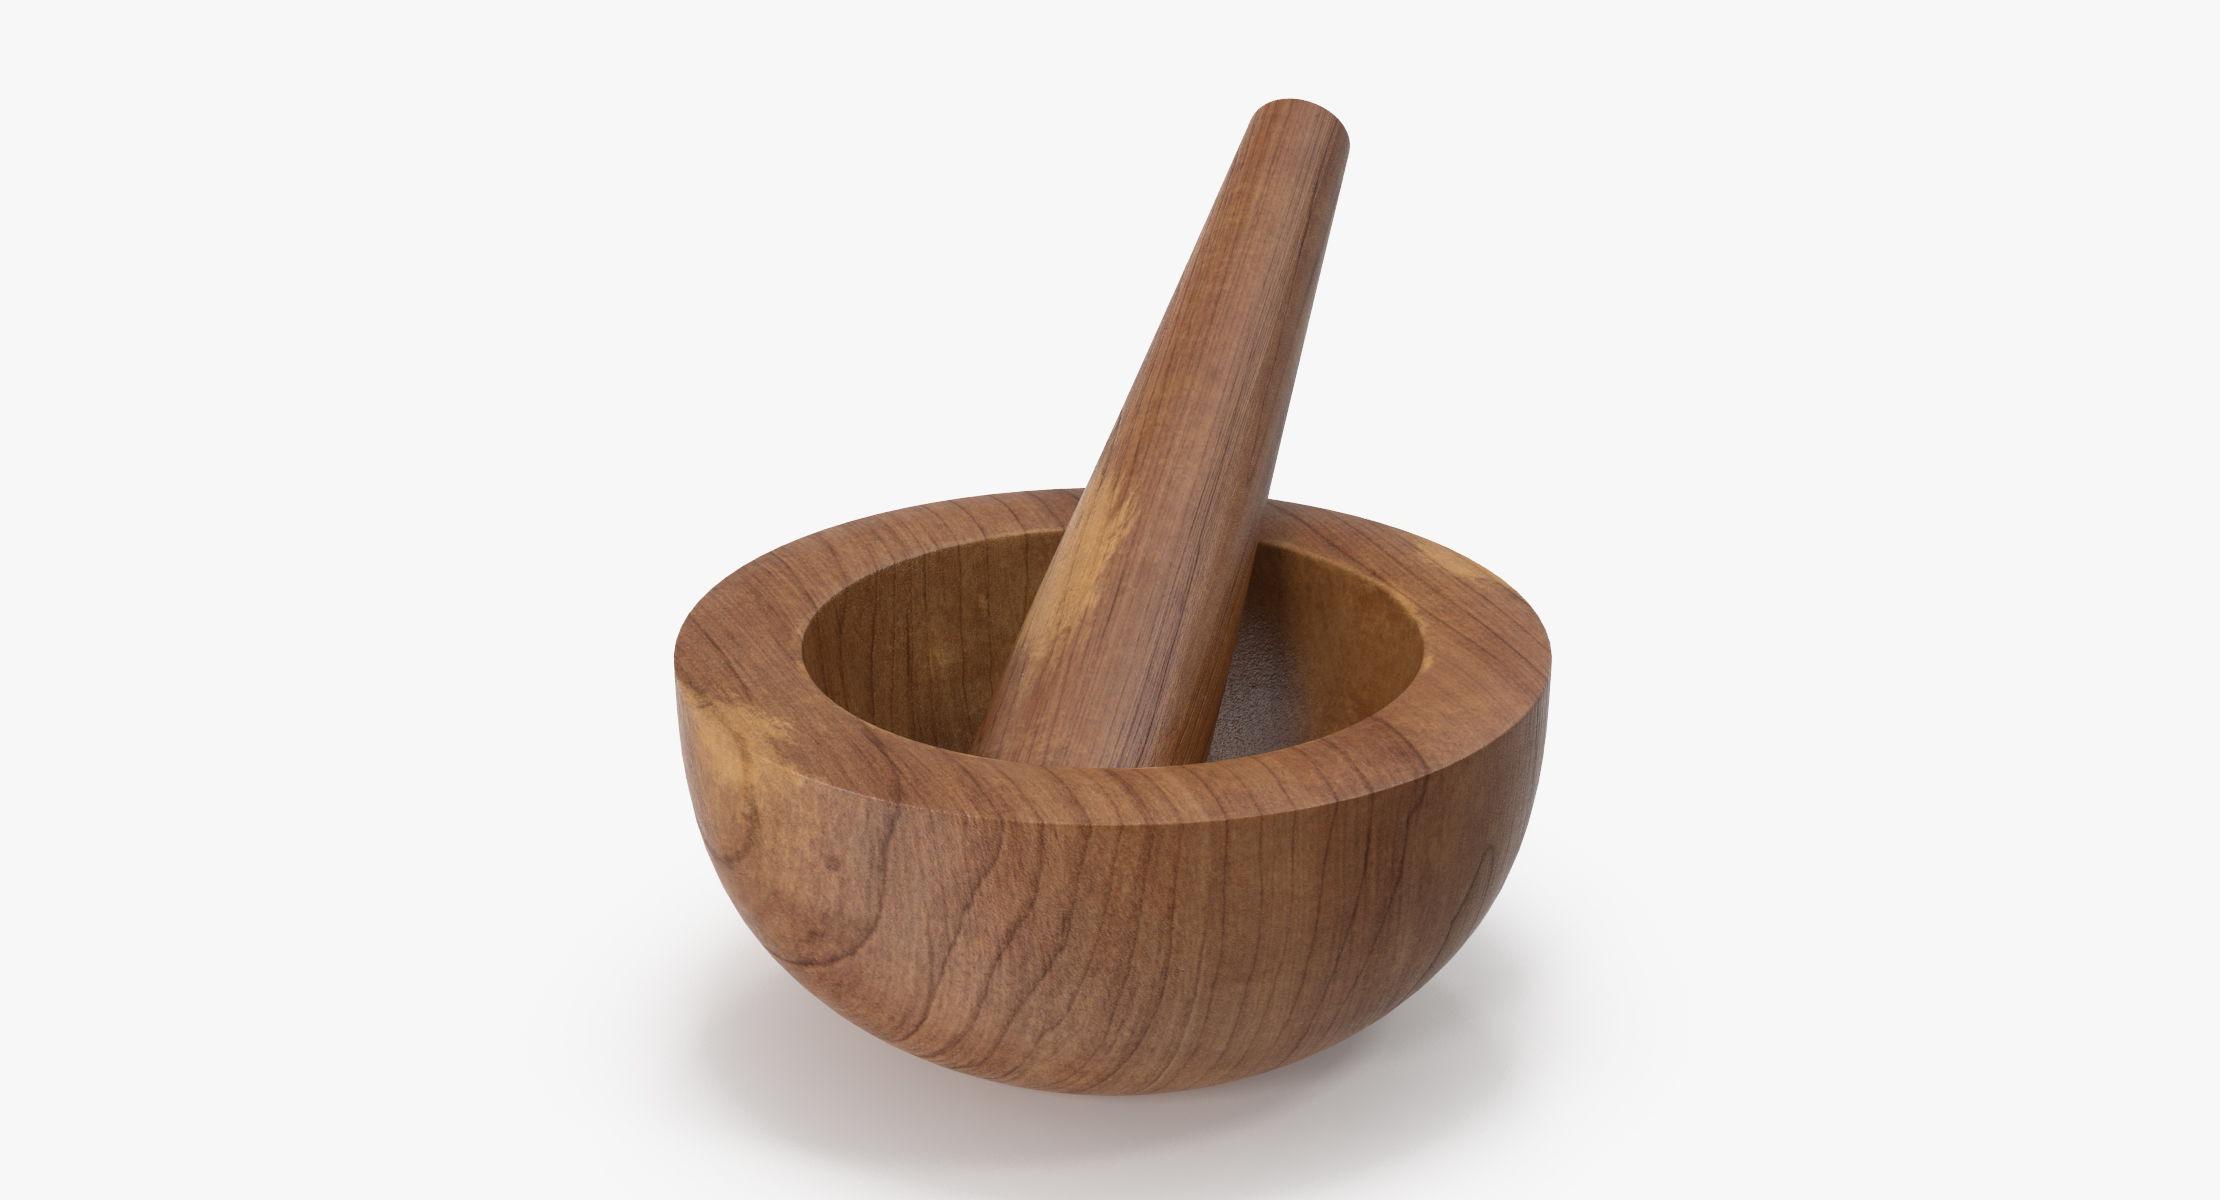 Wood Mortar and Pestle - reel 1